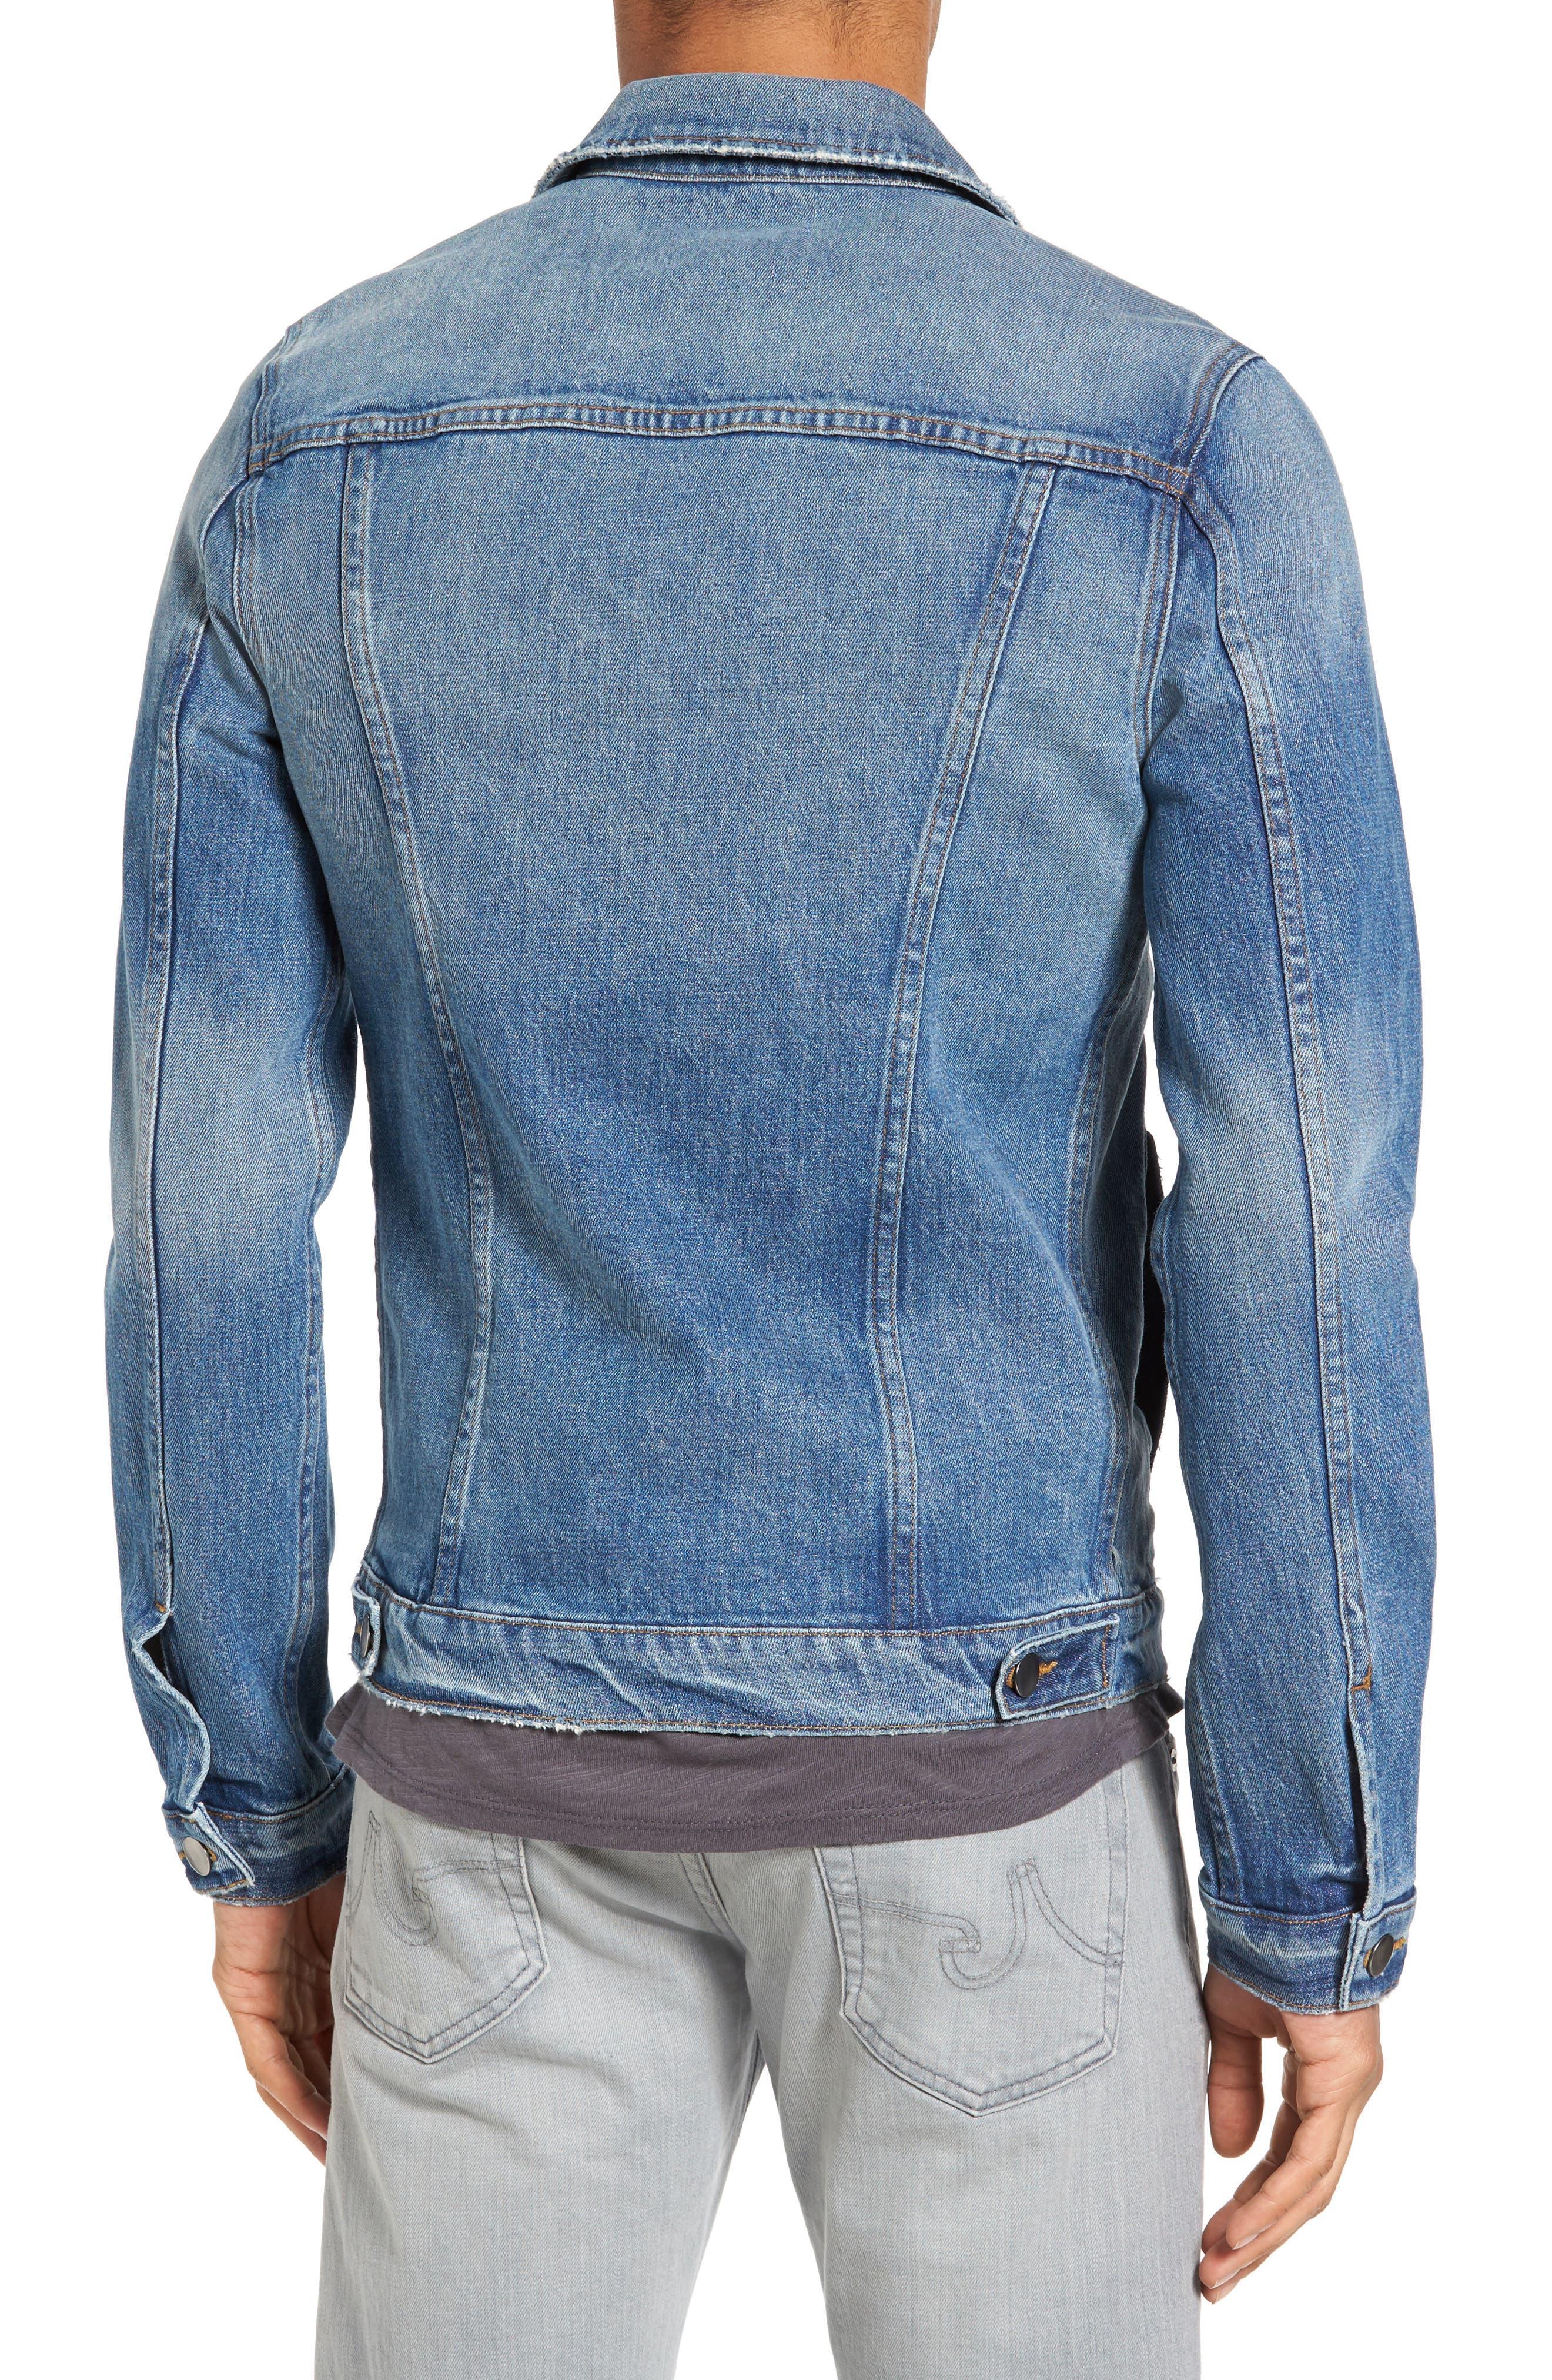 L'Homme Slim Denim Jacket,                             Alternate thumbnail 2, color,                             420